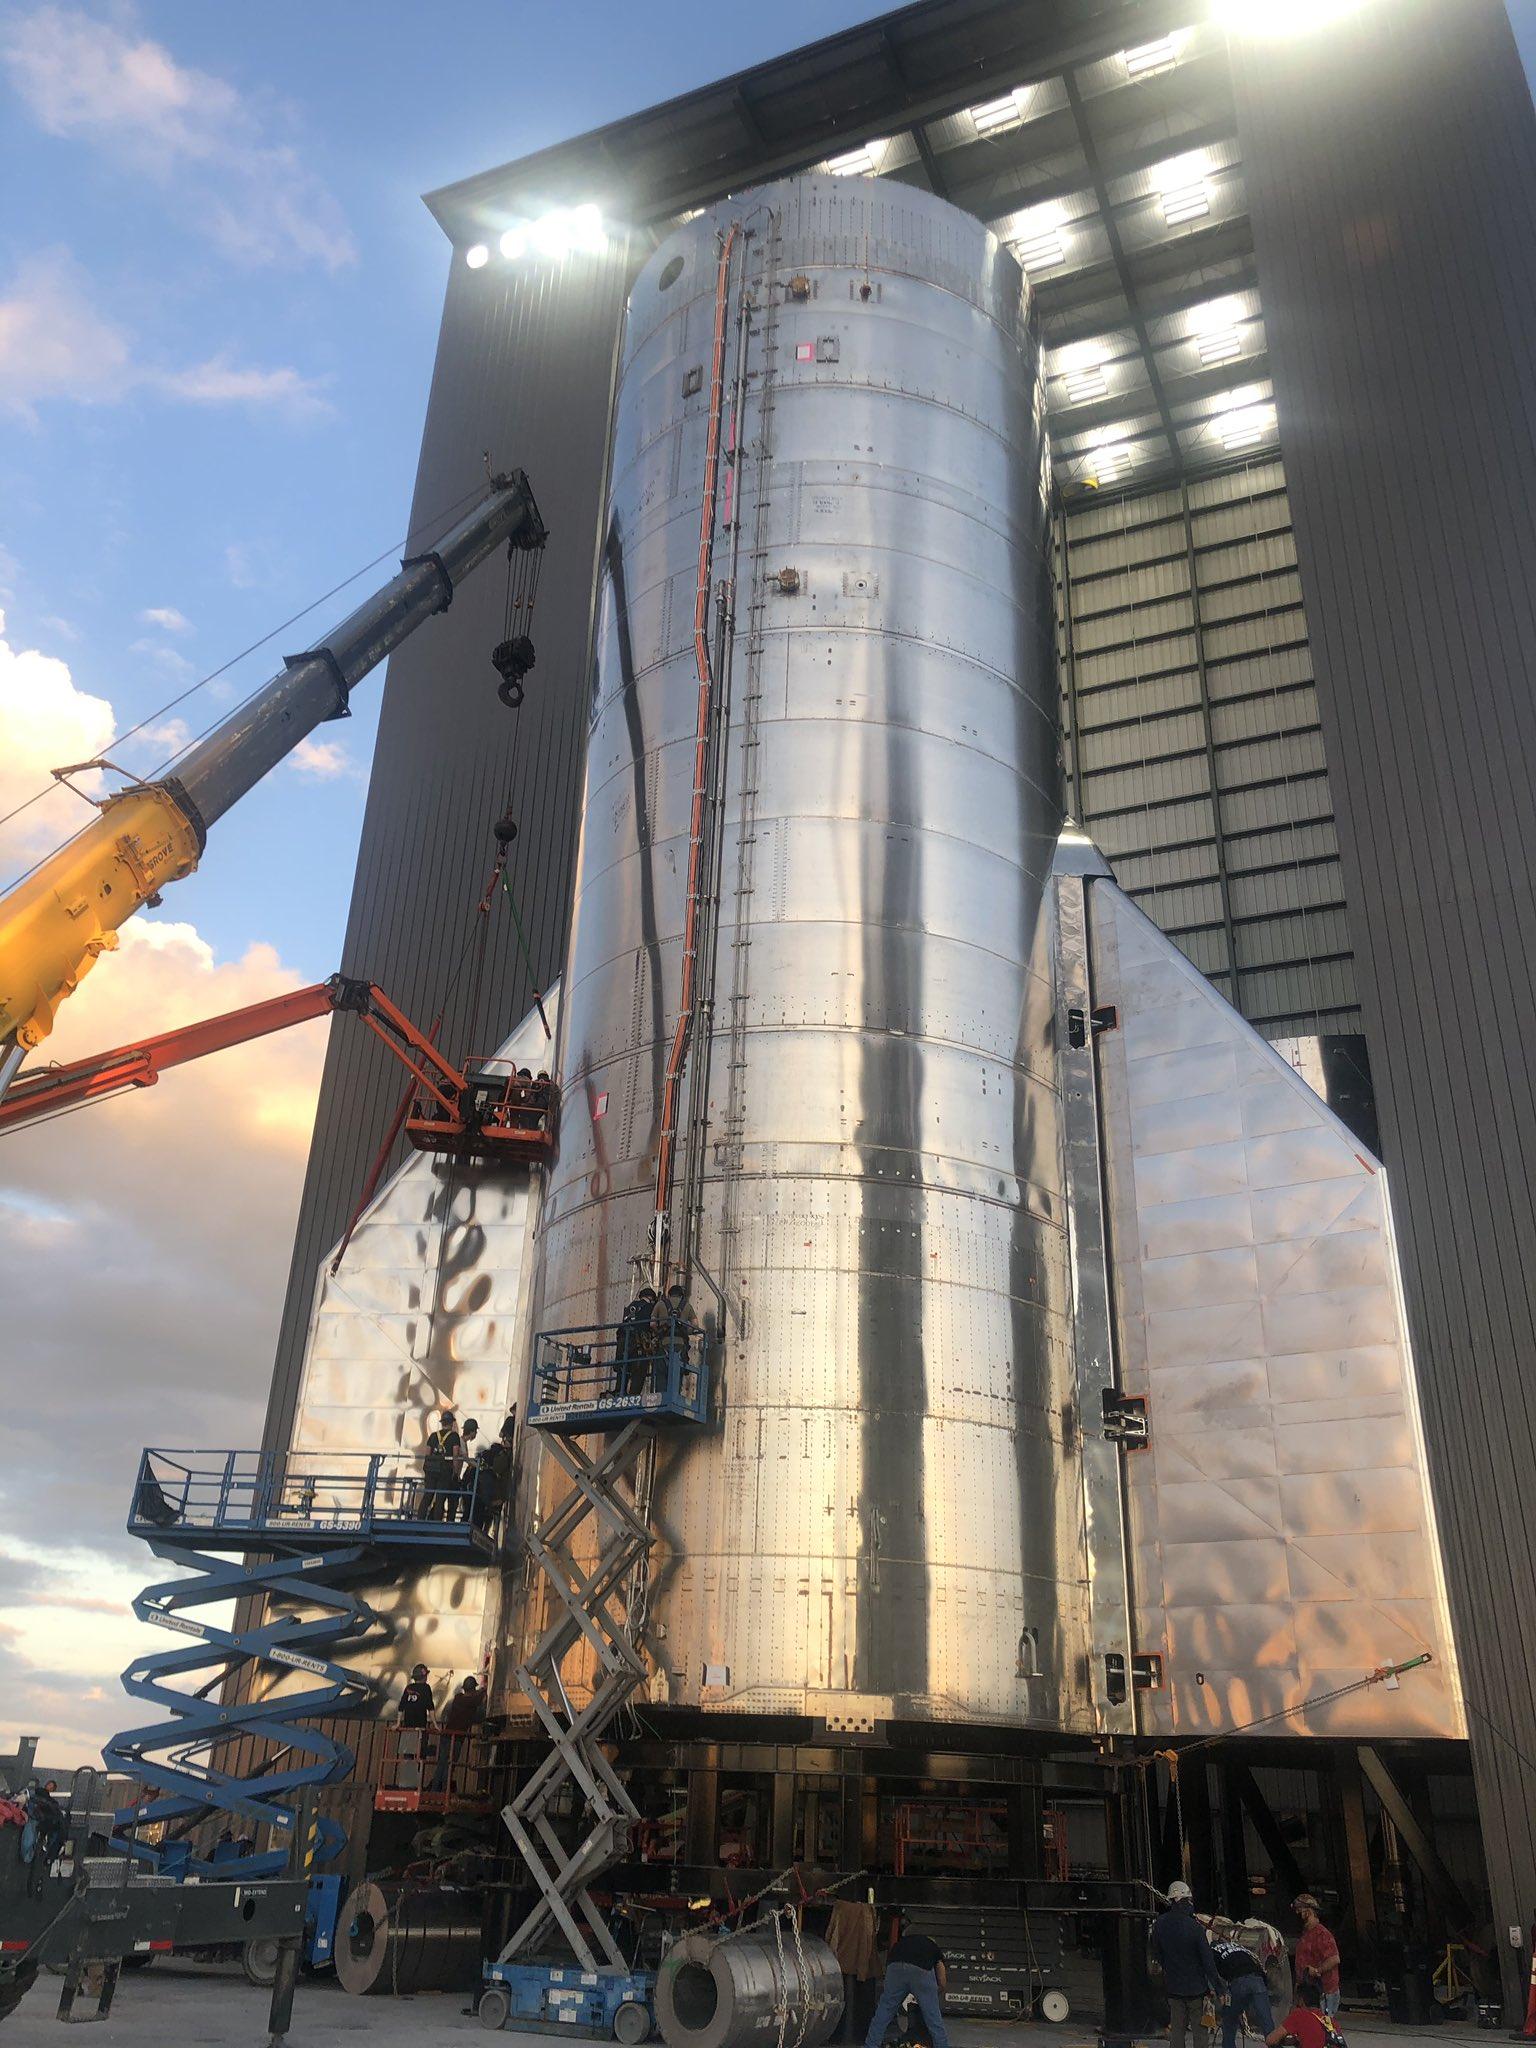 Starship SN8 (Boca Chica) (1/2) - Page 6 Ei279UbUYAAHzlj?format=jpg&name=large